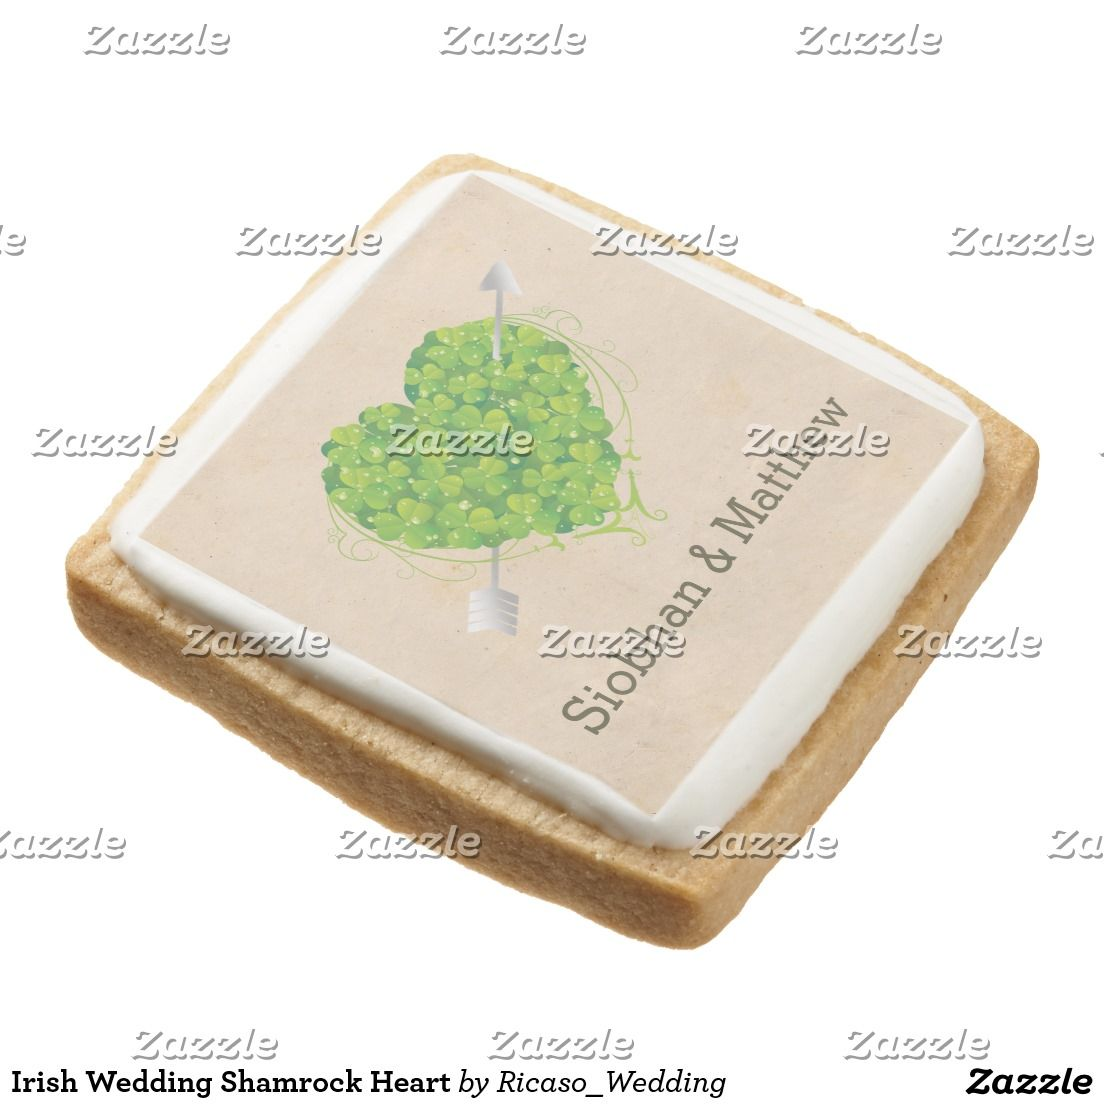 Irish Wedding Shamrock Heart Square Shortbread Cookie | Wedding and ...